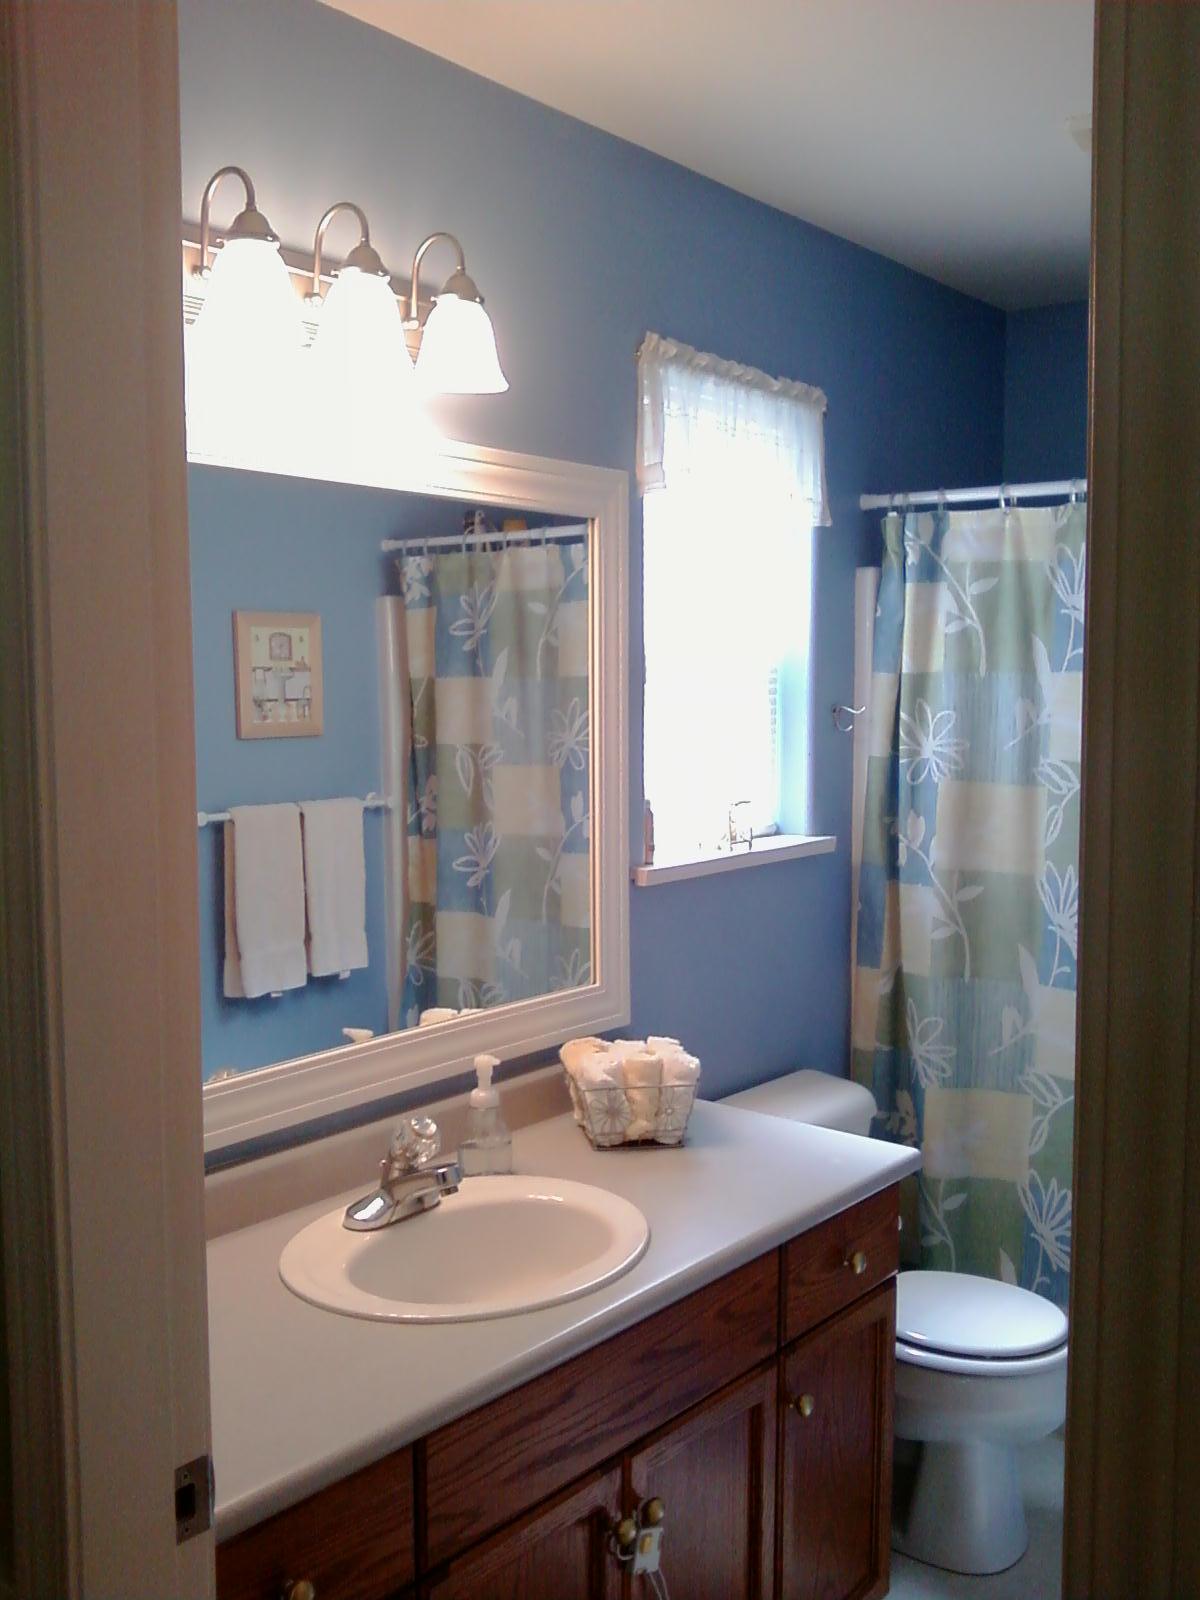 This Thrifty House: Framed Bathroom Mirror